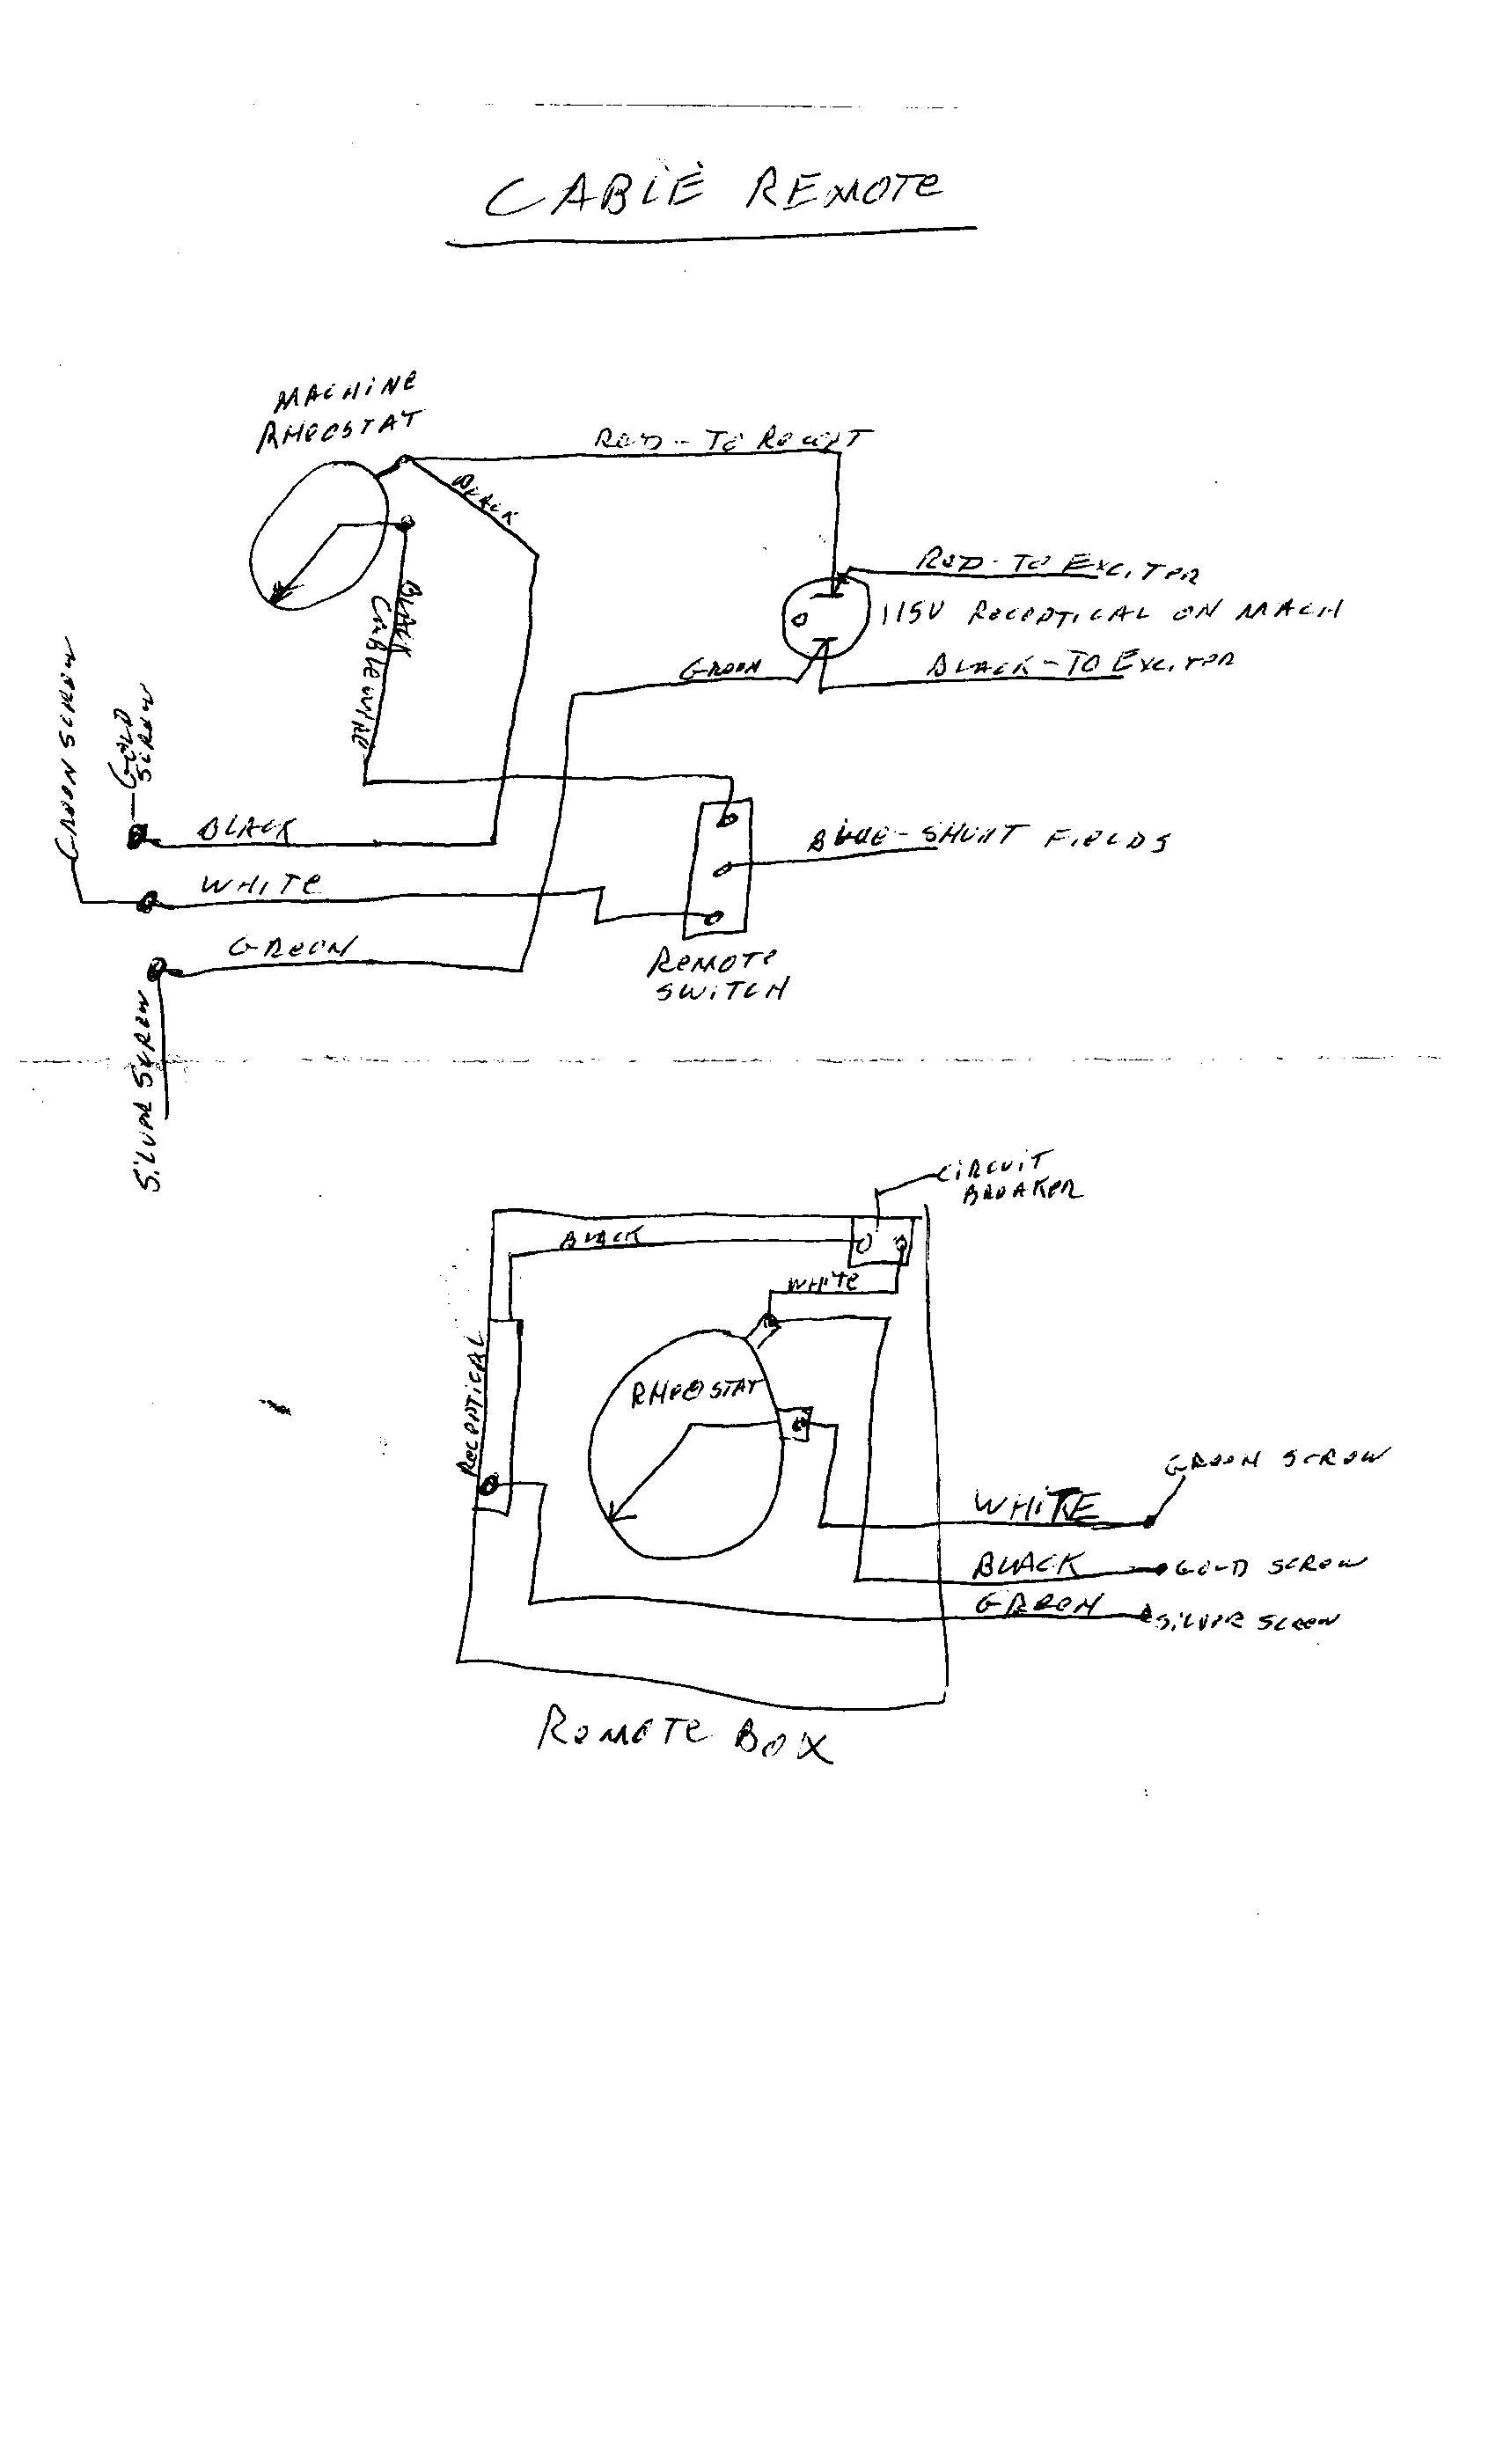 Lincoln Sa 200 Remote Wiring Diagram   36 Wiring Diagram